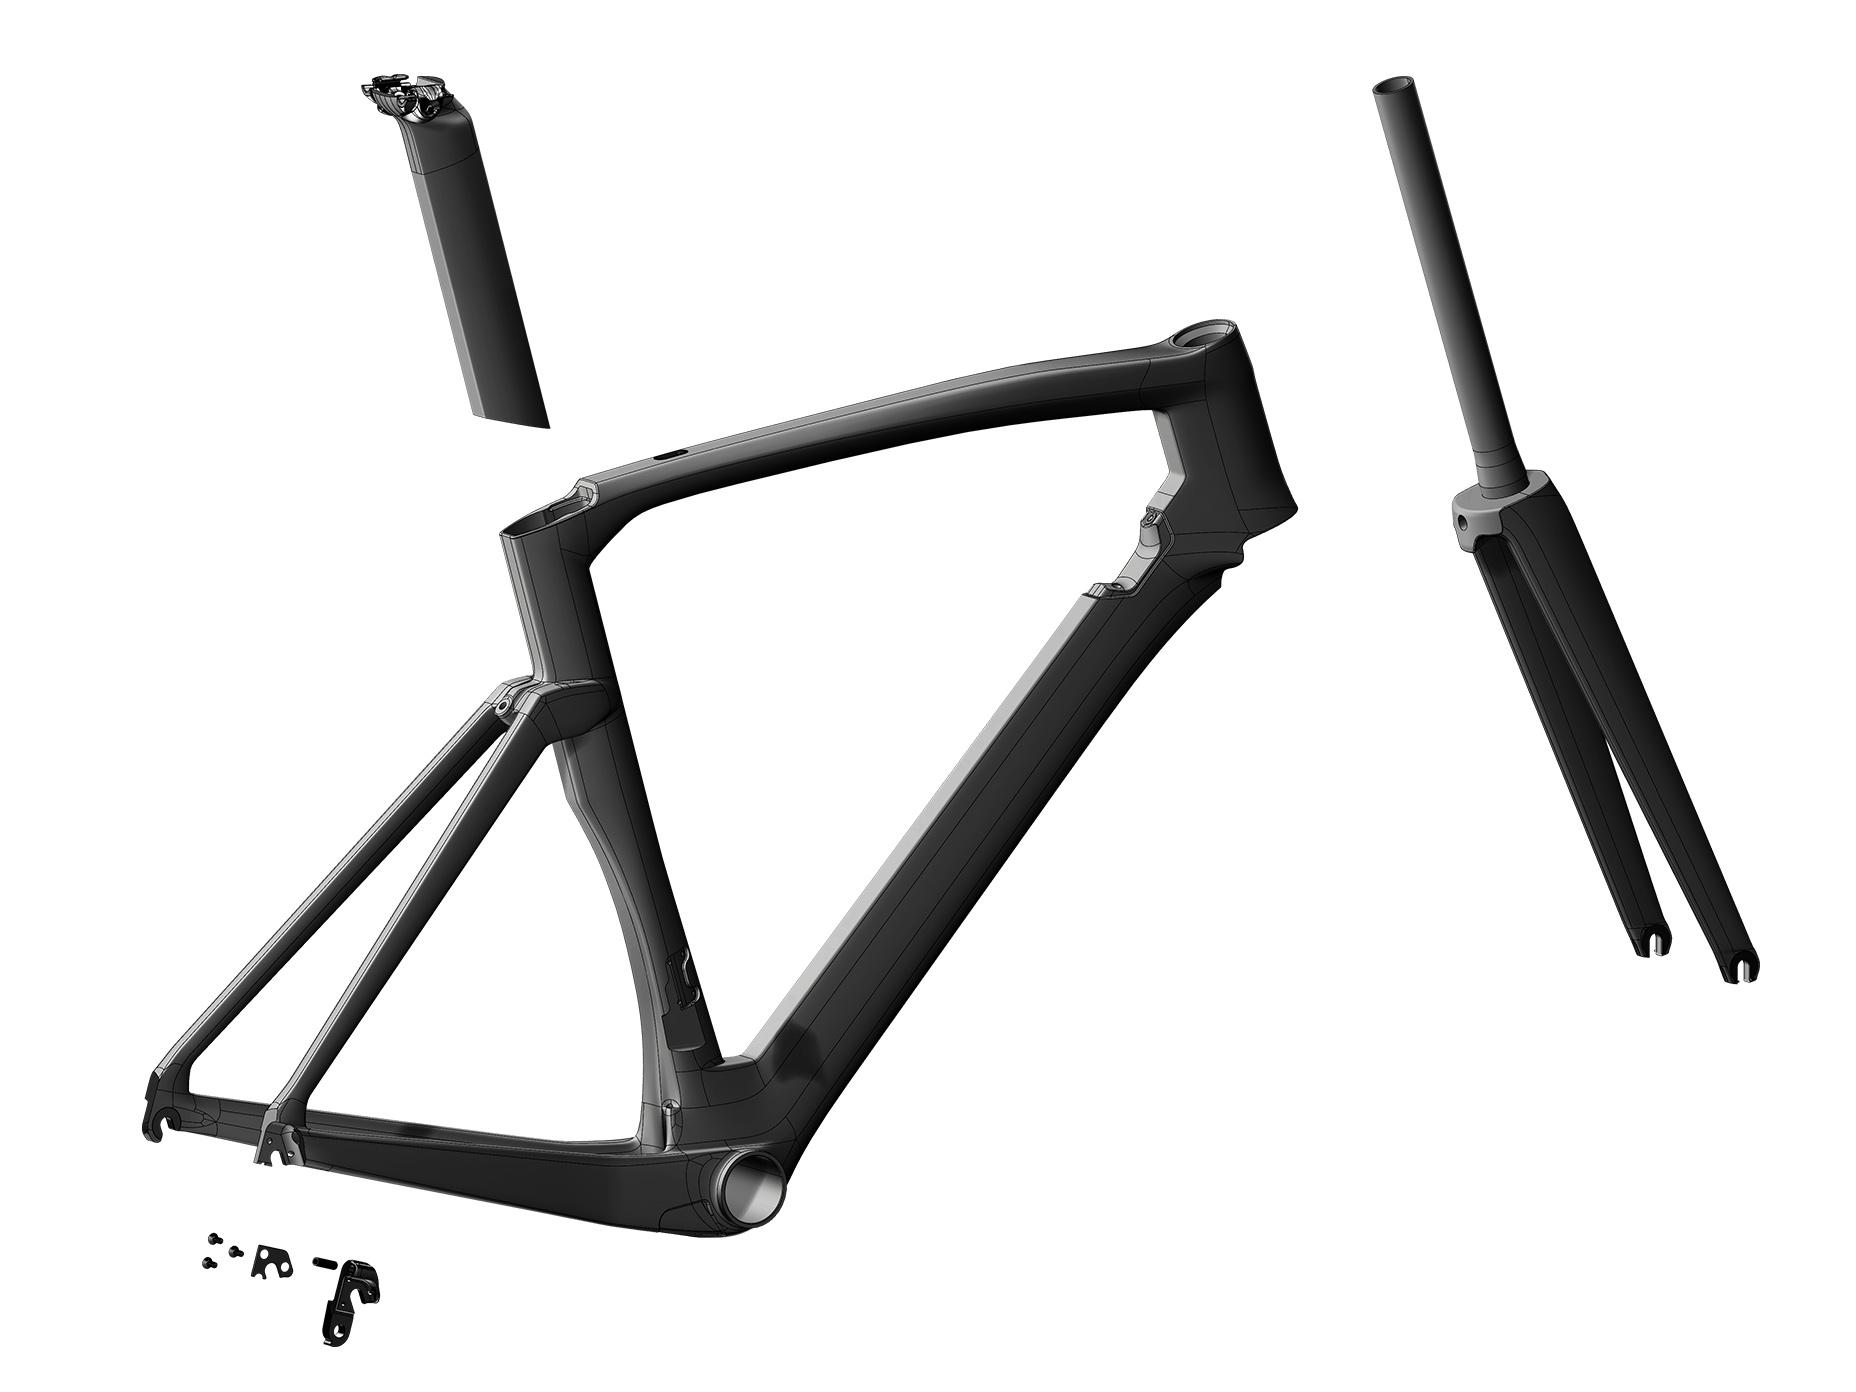 1a4d93bfb42 Cento1AIR | Road bikes Wilier Triestina